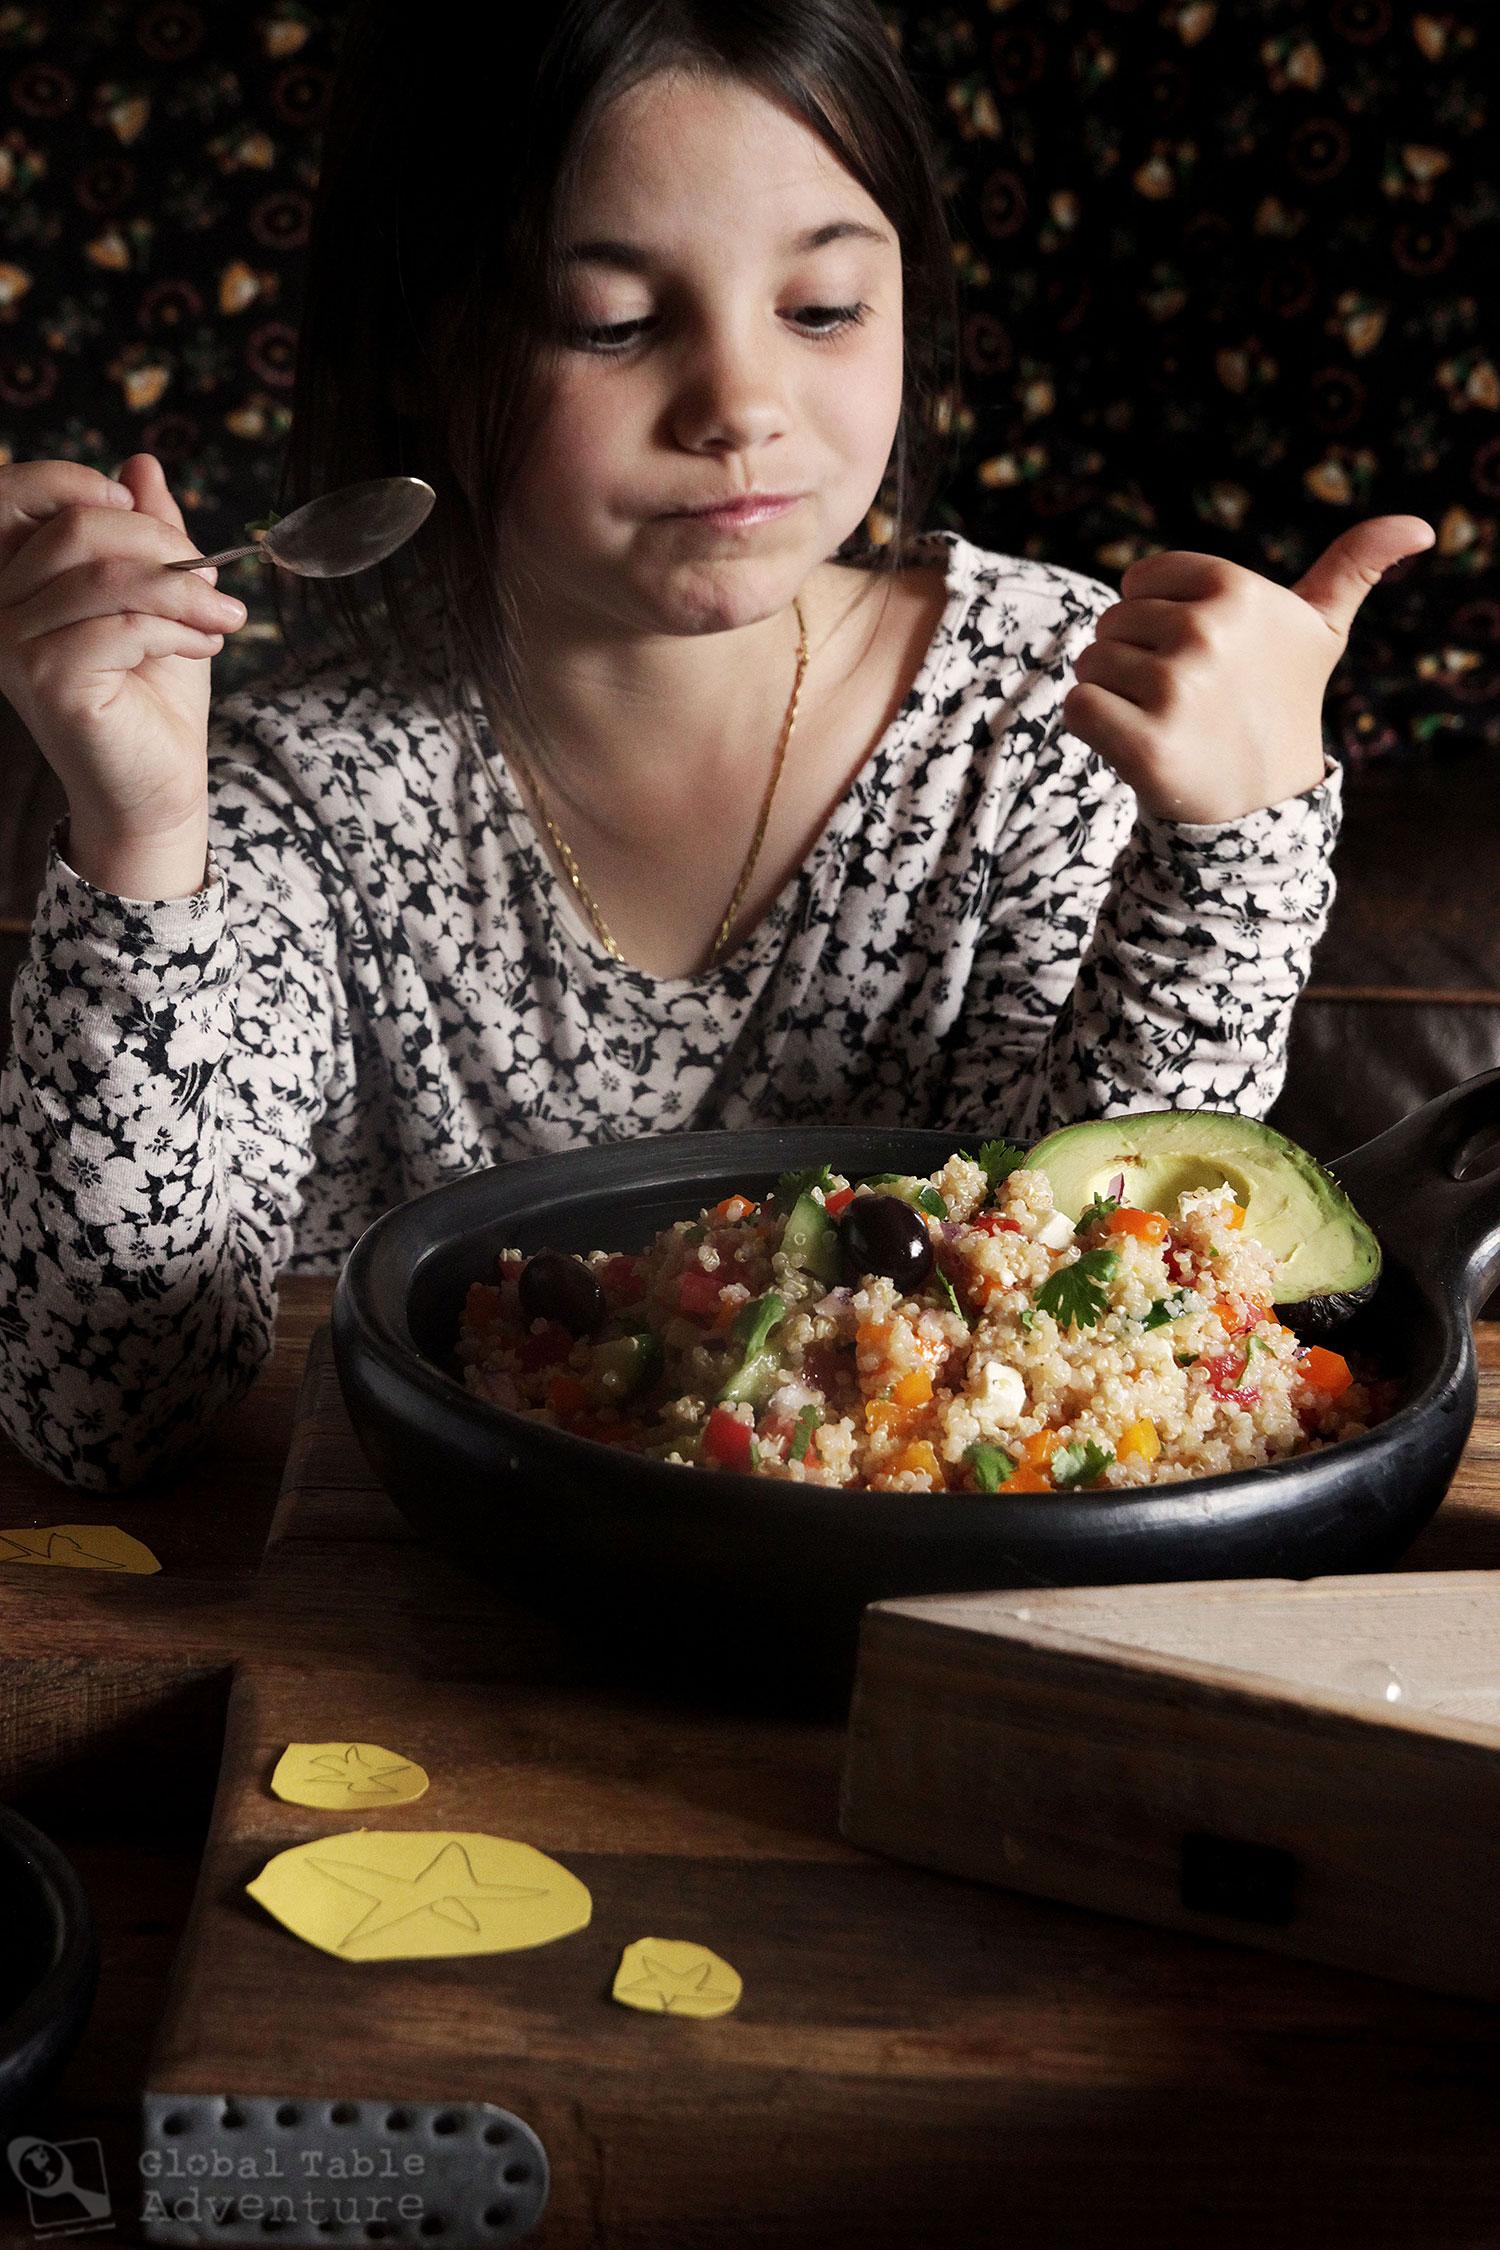 Recipe for Peruvian Quinoa Salad